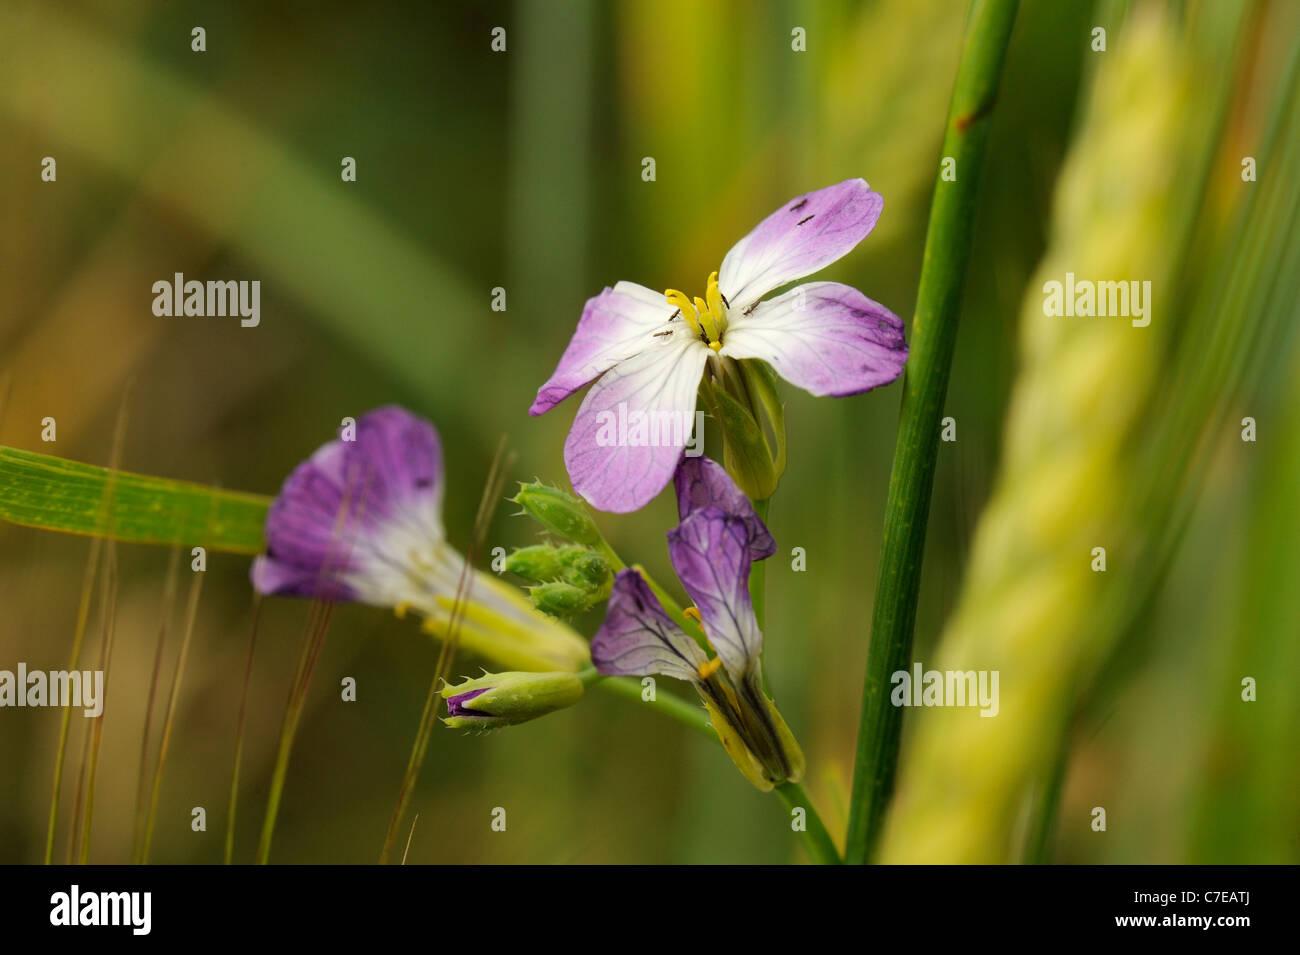 Garden Radish, raphanus sativus Stock Photo